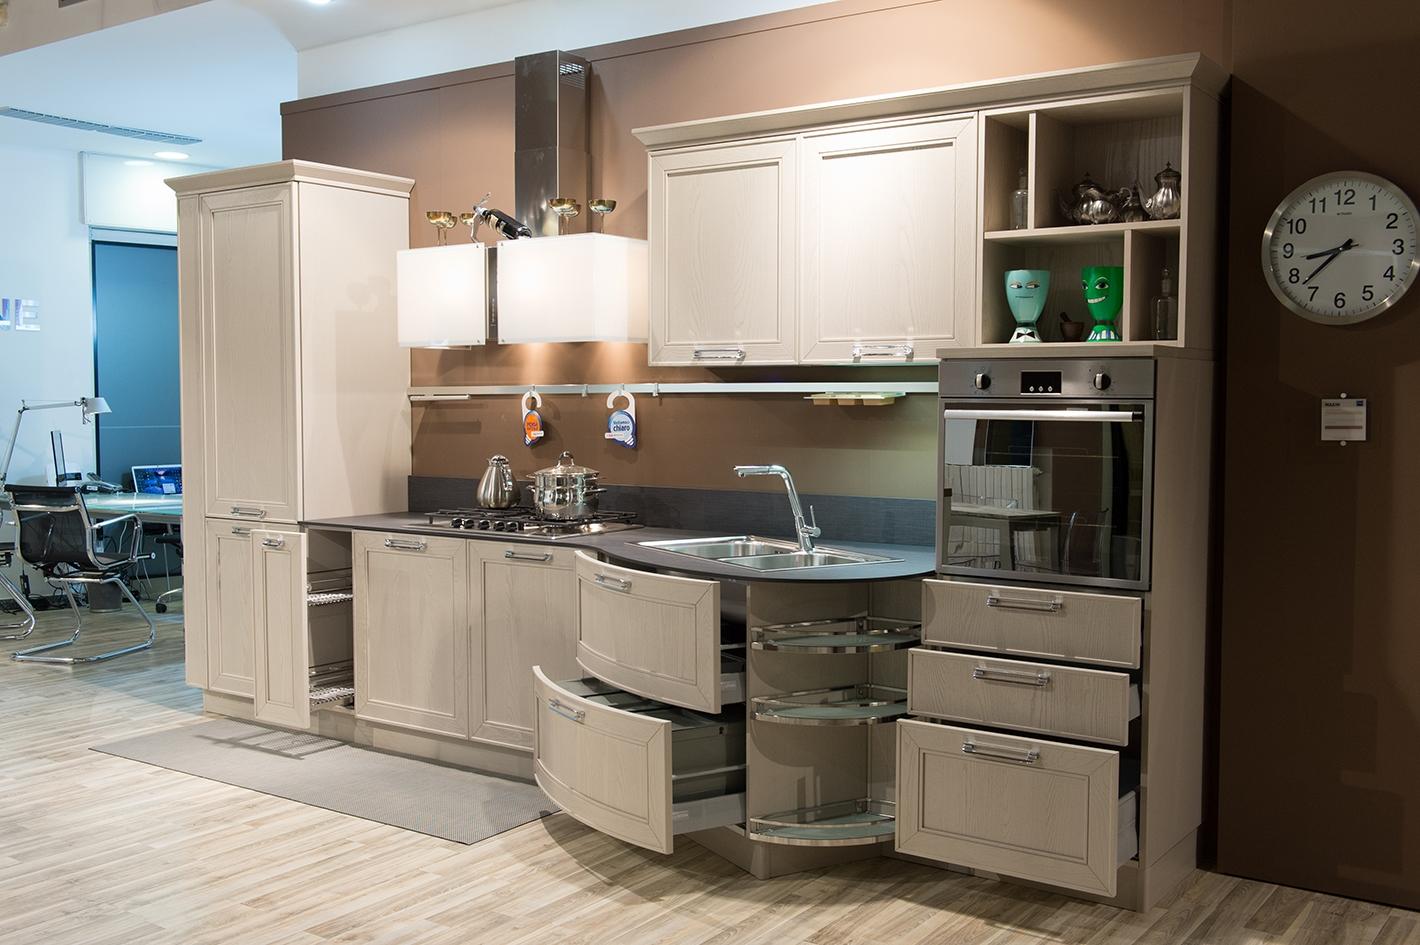 Cucina stosa mod maxim completa di elettrodomestici 20232 - Disposizione elettrodomestici cucina ...